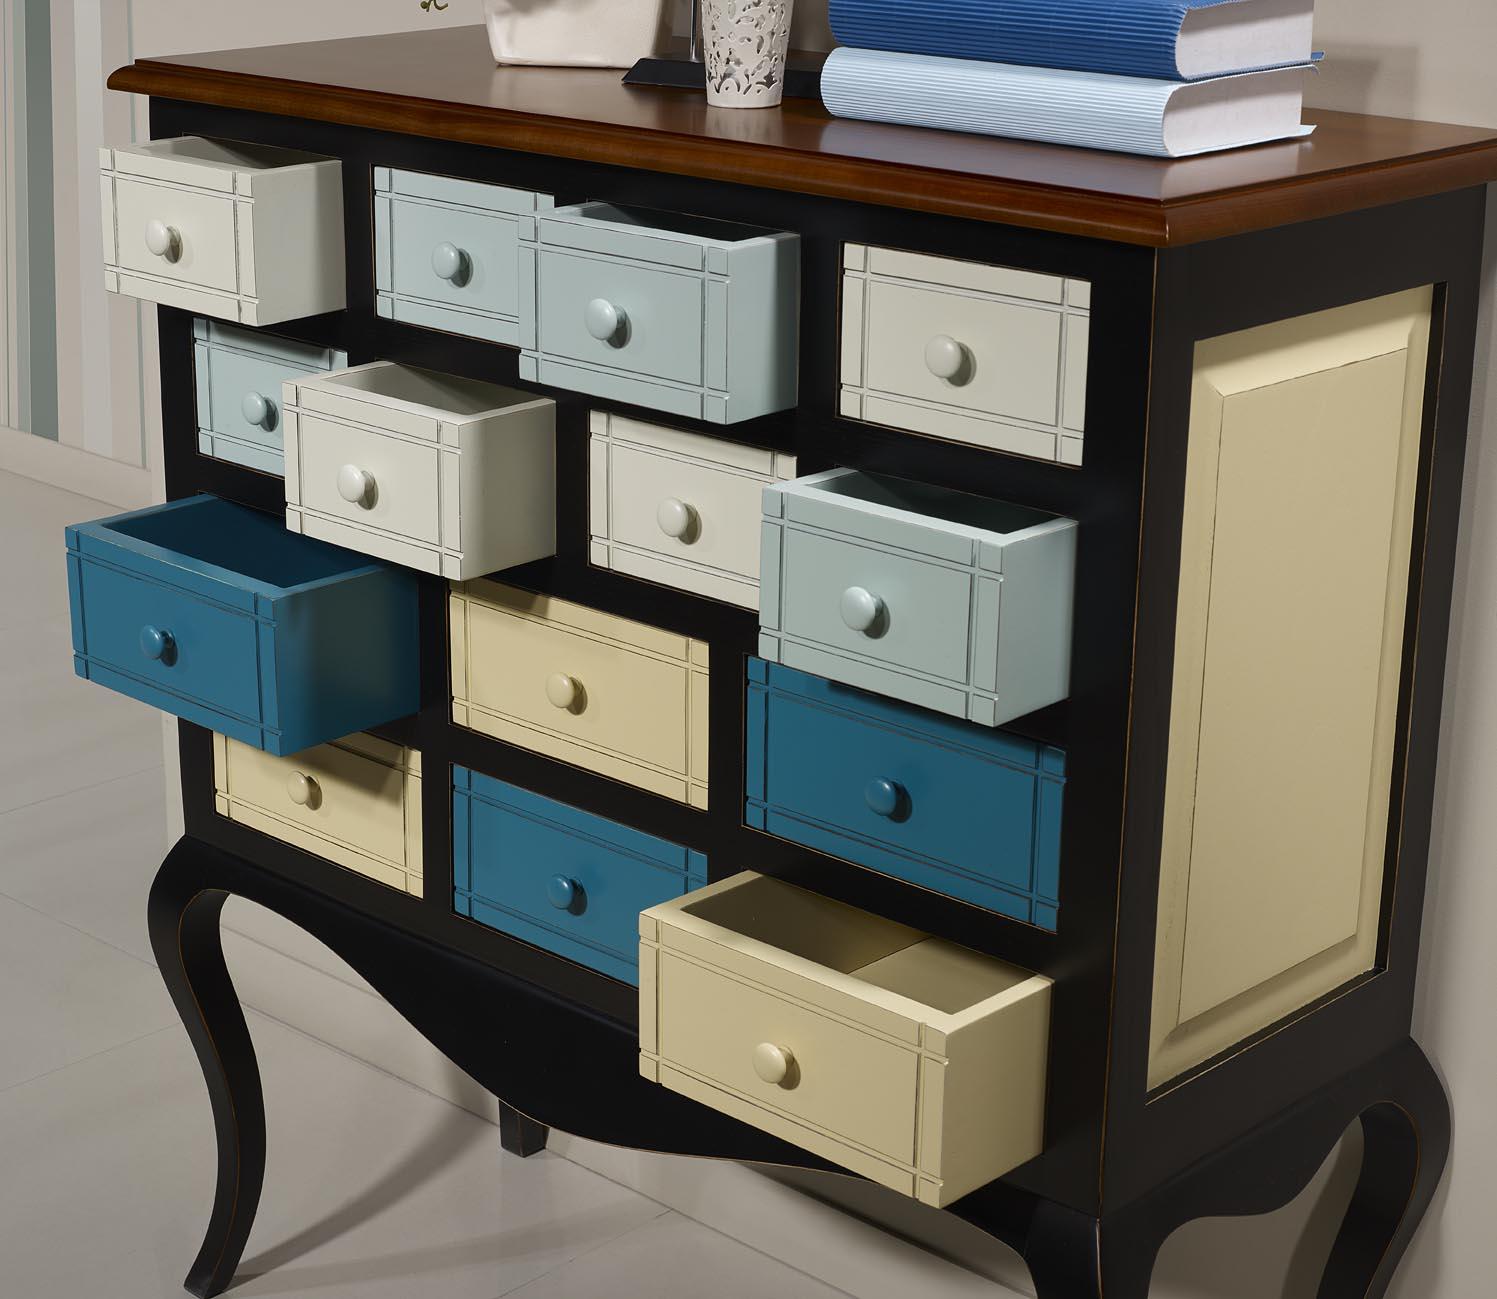 commode ou meuble d 39 entr e selena en merisier et chataignier multicolore meuble en merisier. Black Bedroom Furniture Sets. Home Design Ideas